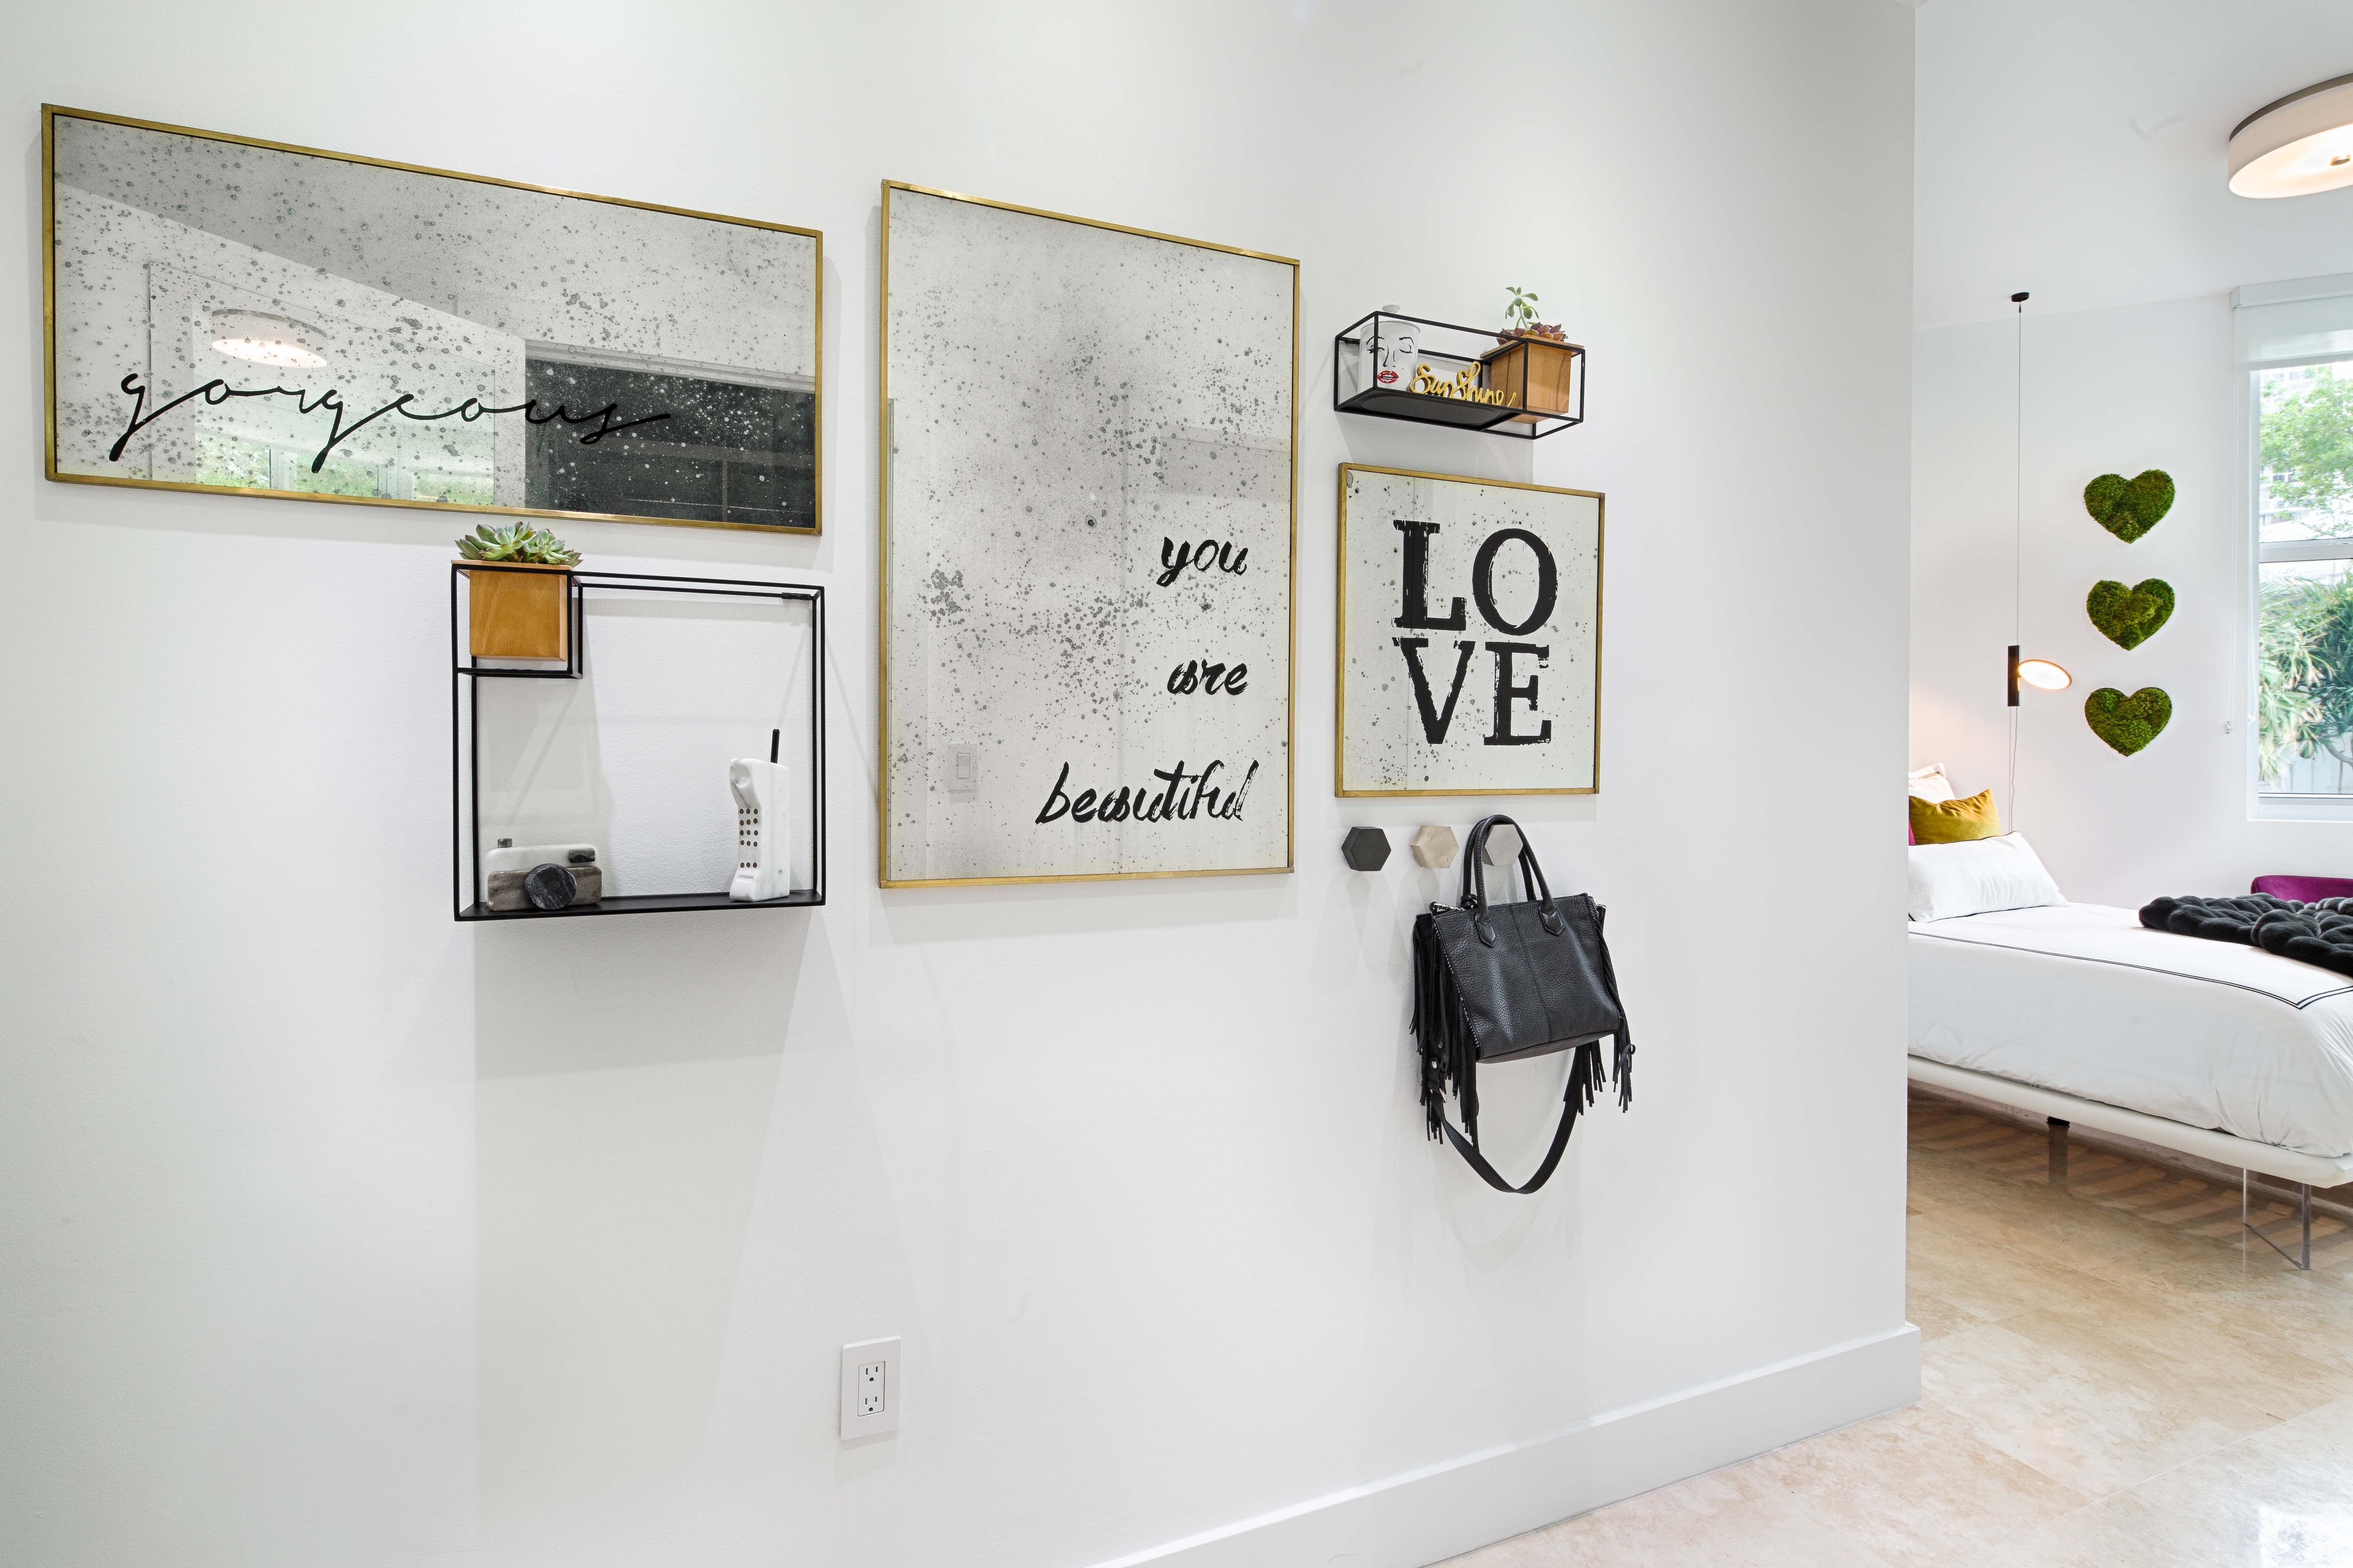 doral teen gallery